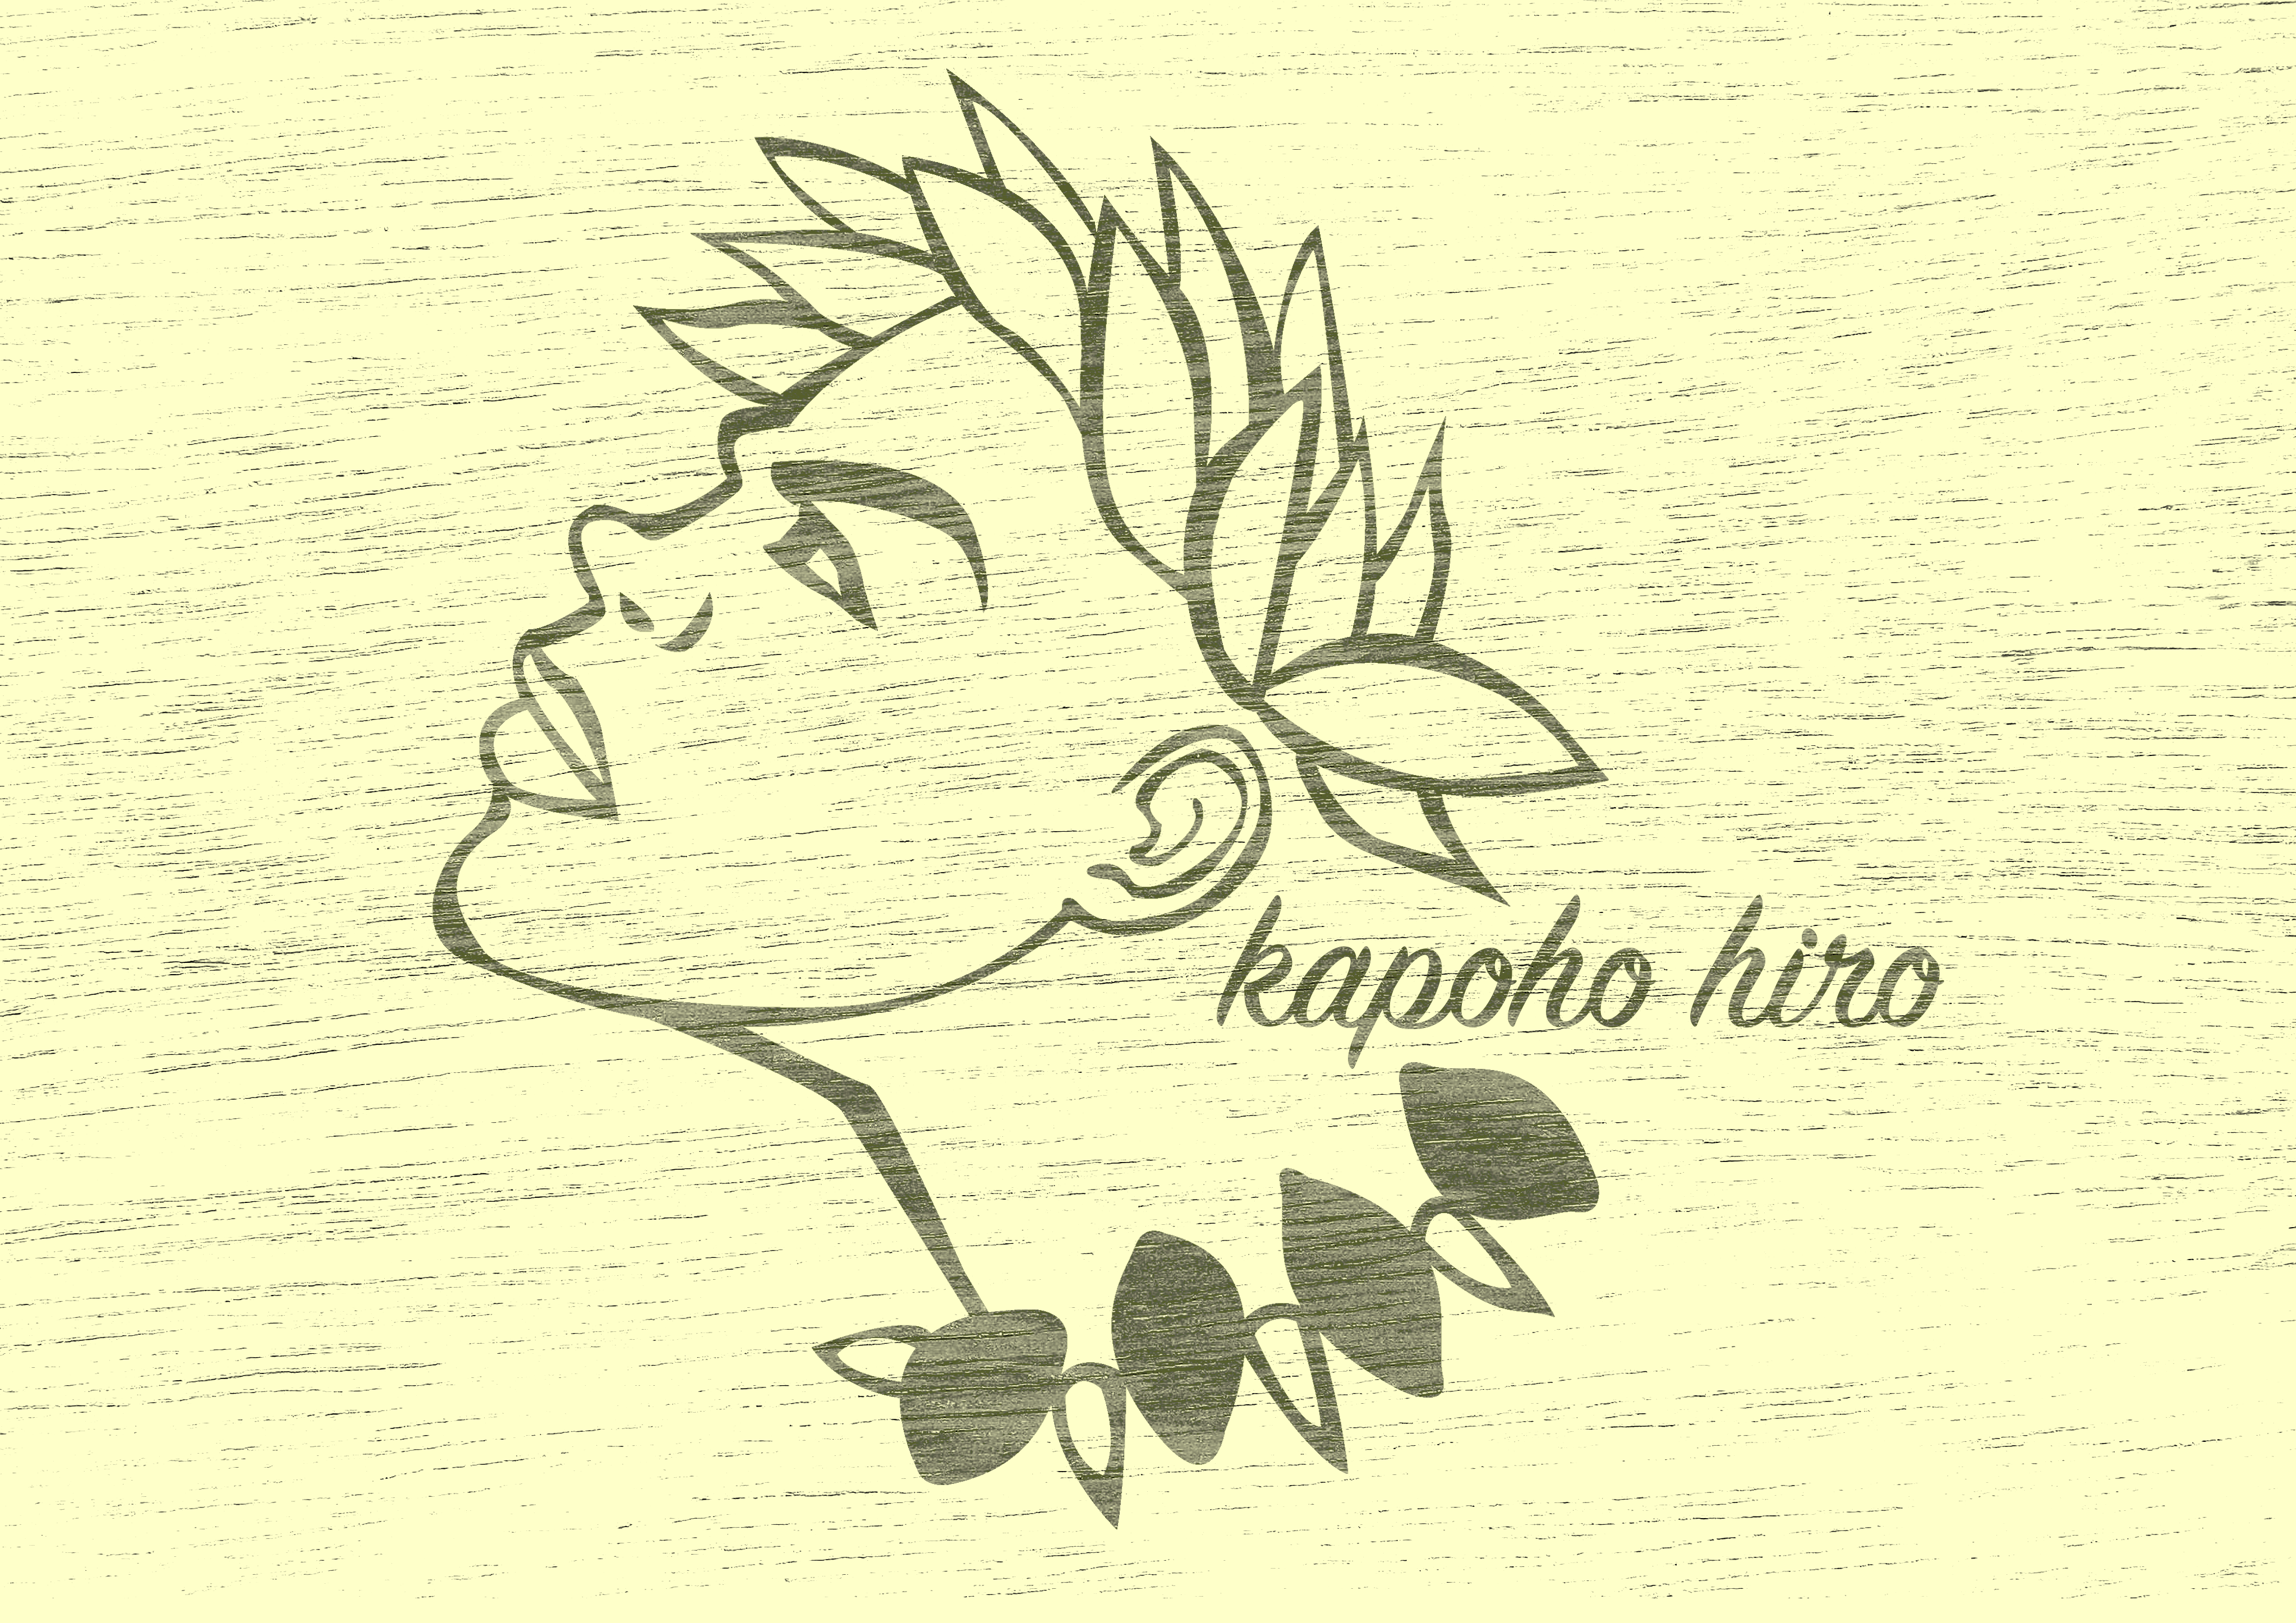 kapoho hiro logo01